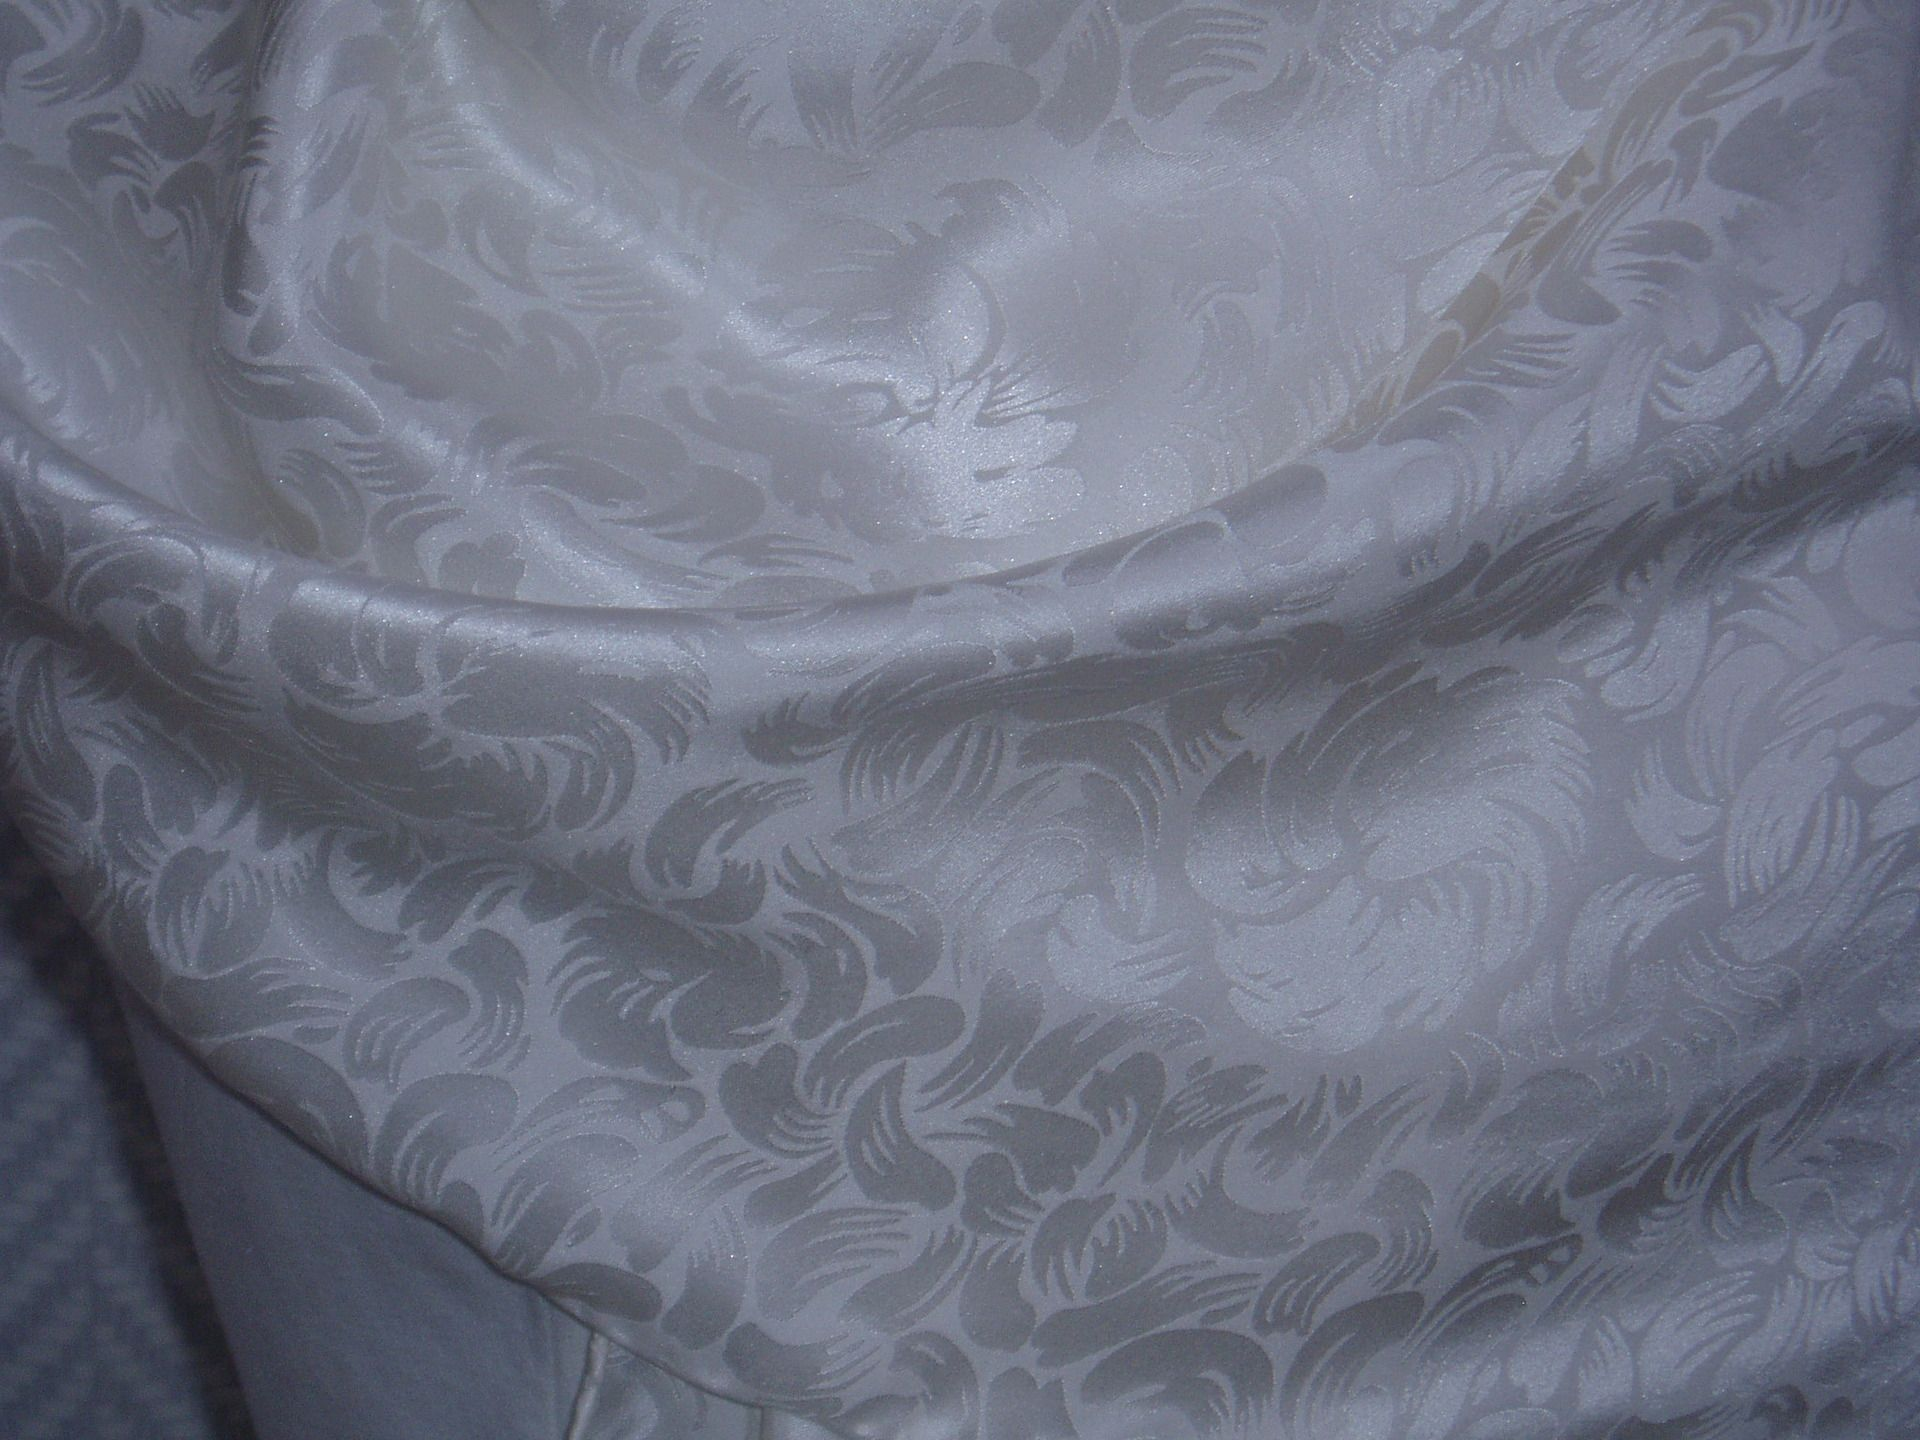 Echarpe étole foulard en soie blanche